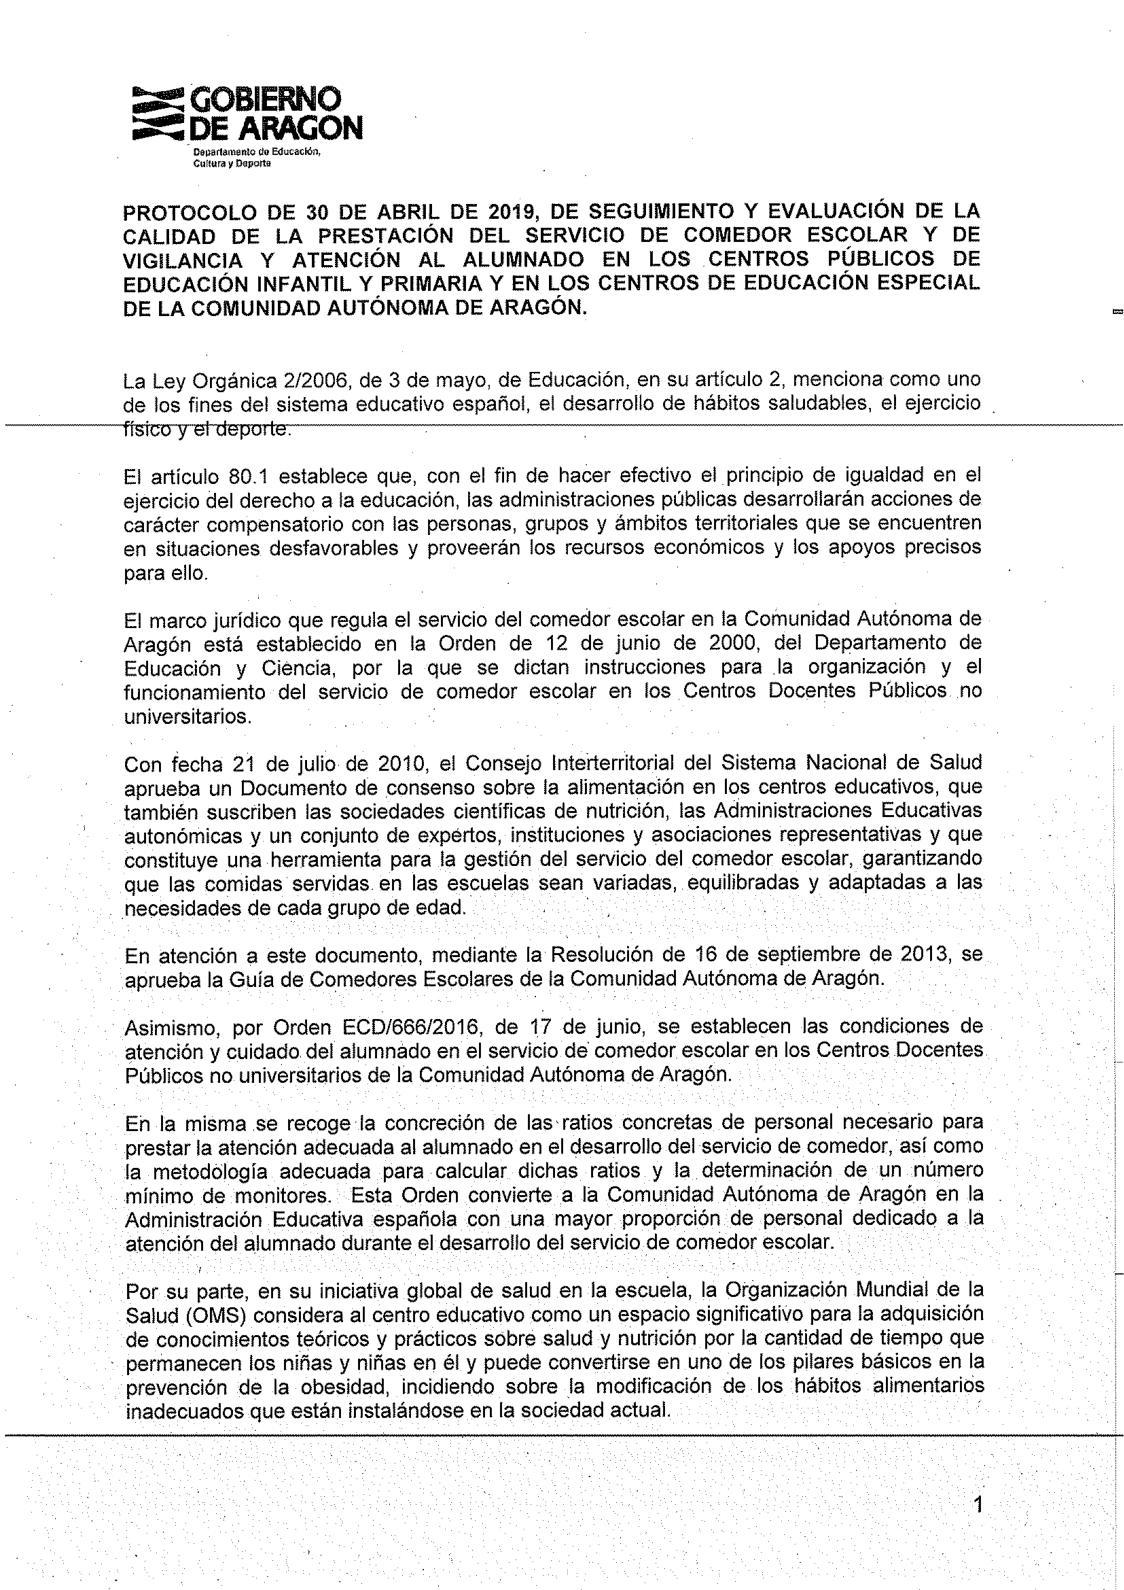 Calaméo - 29 Protocolo Calidad Comedores Escolares Dgpfp 20190430